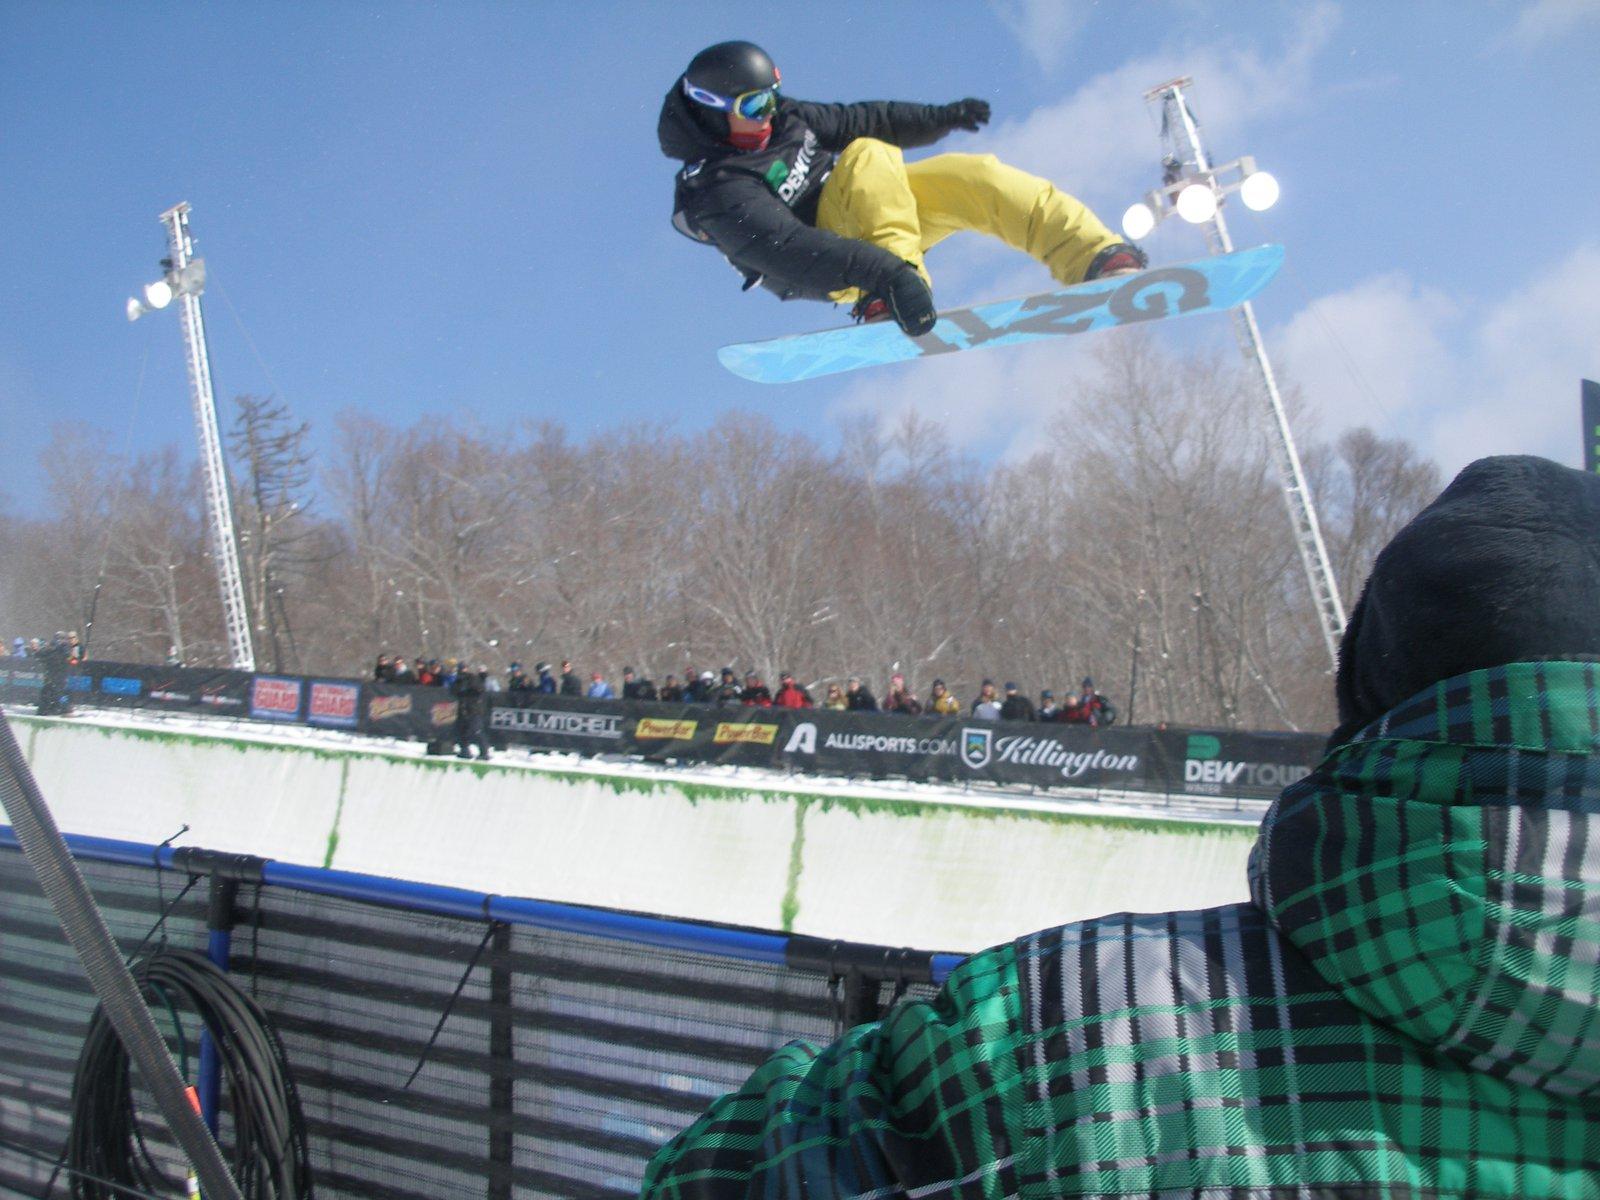 Snowboarding Tricks...